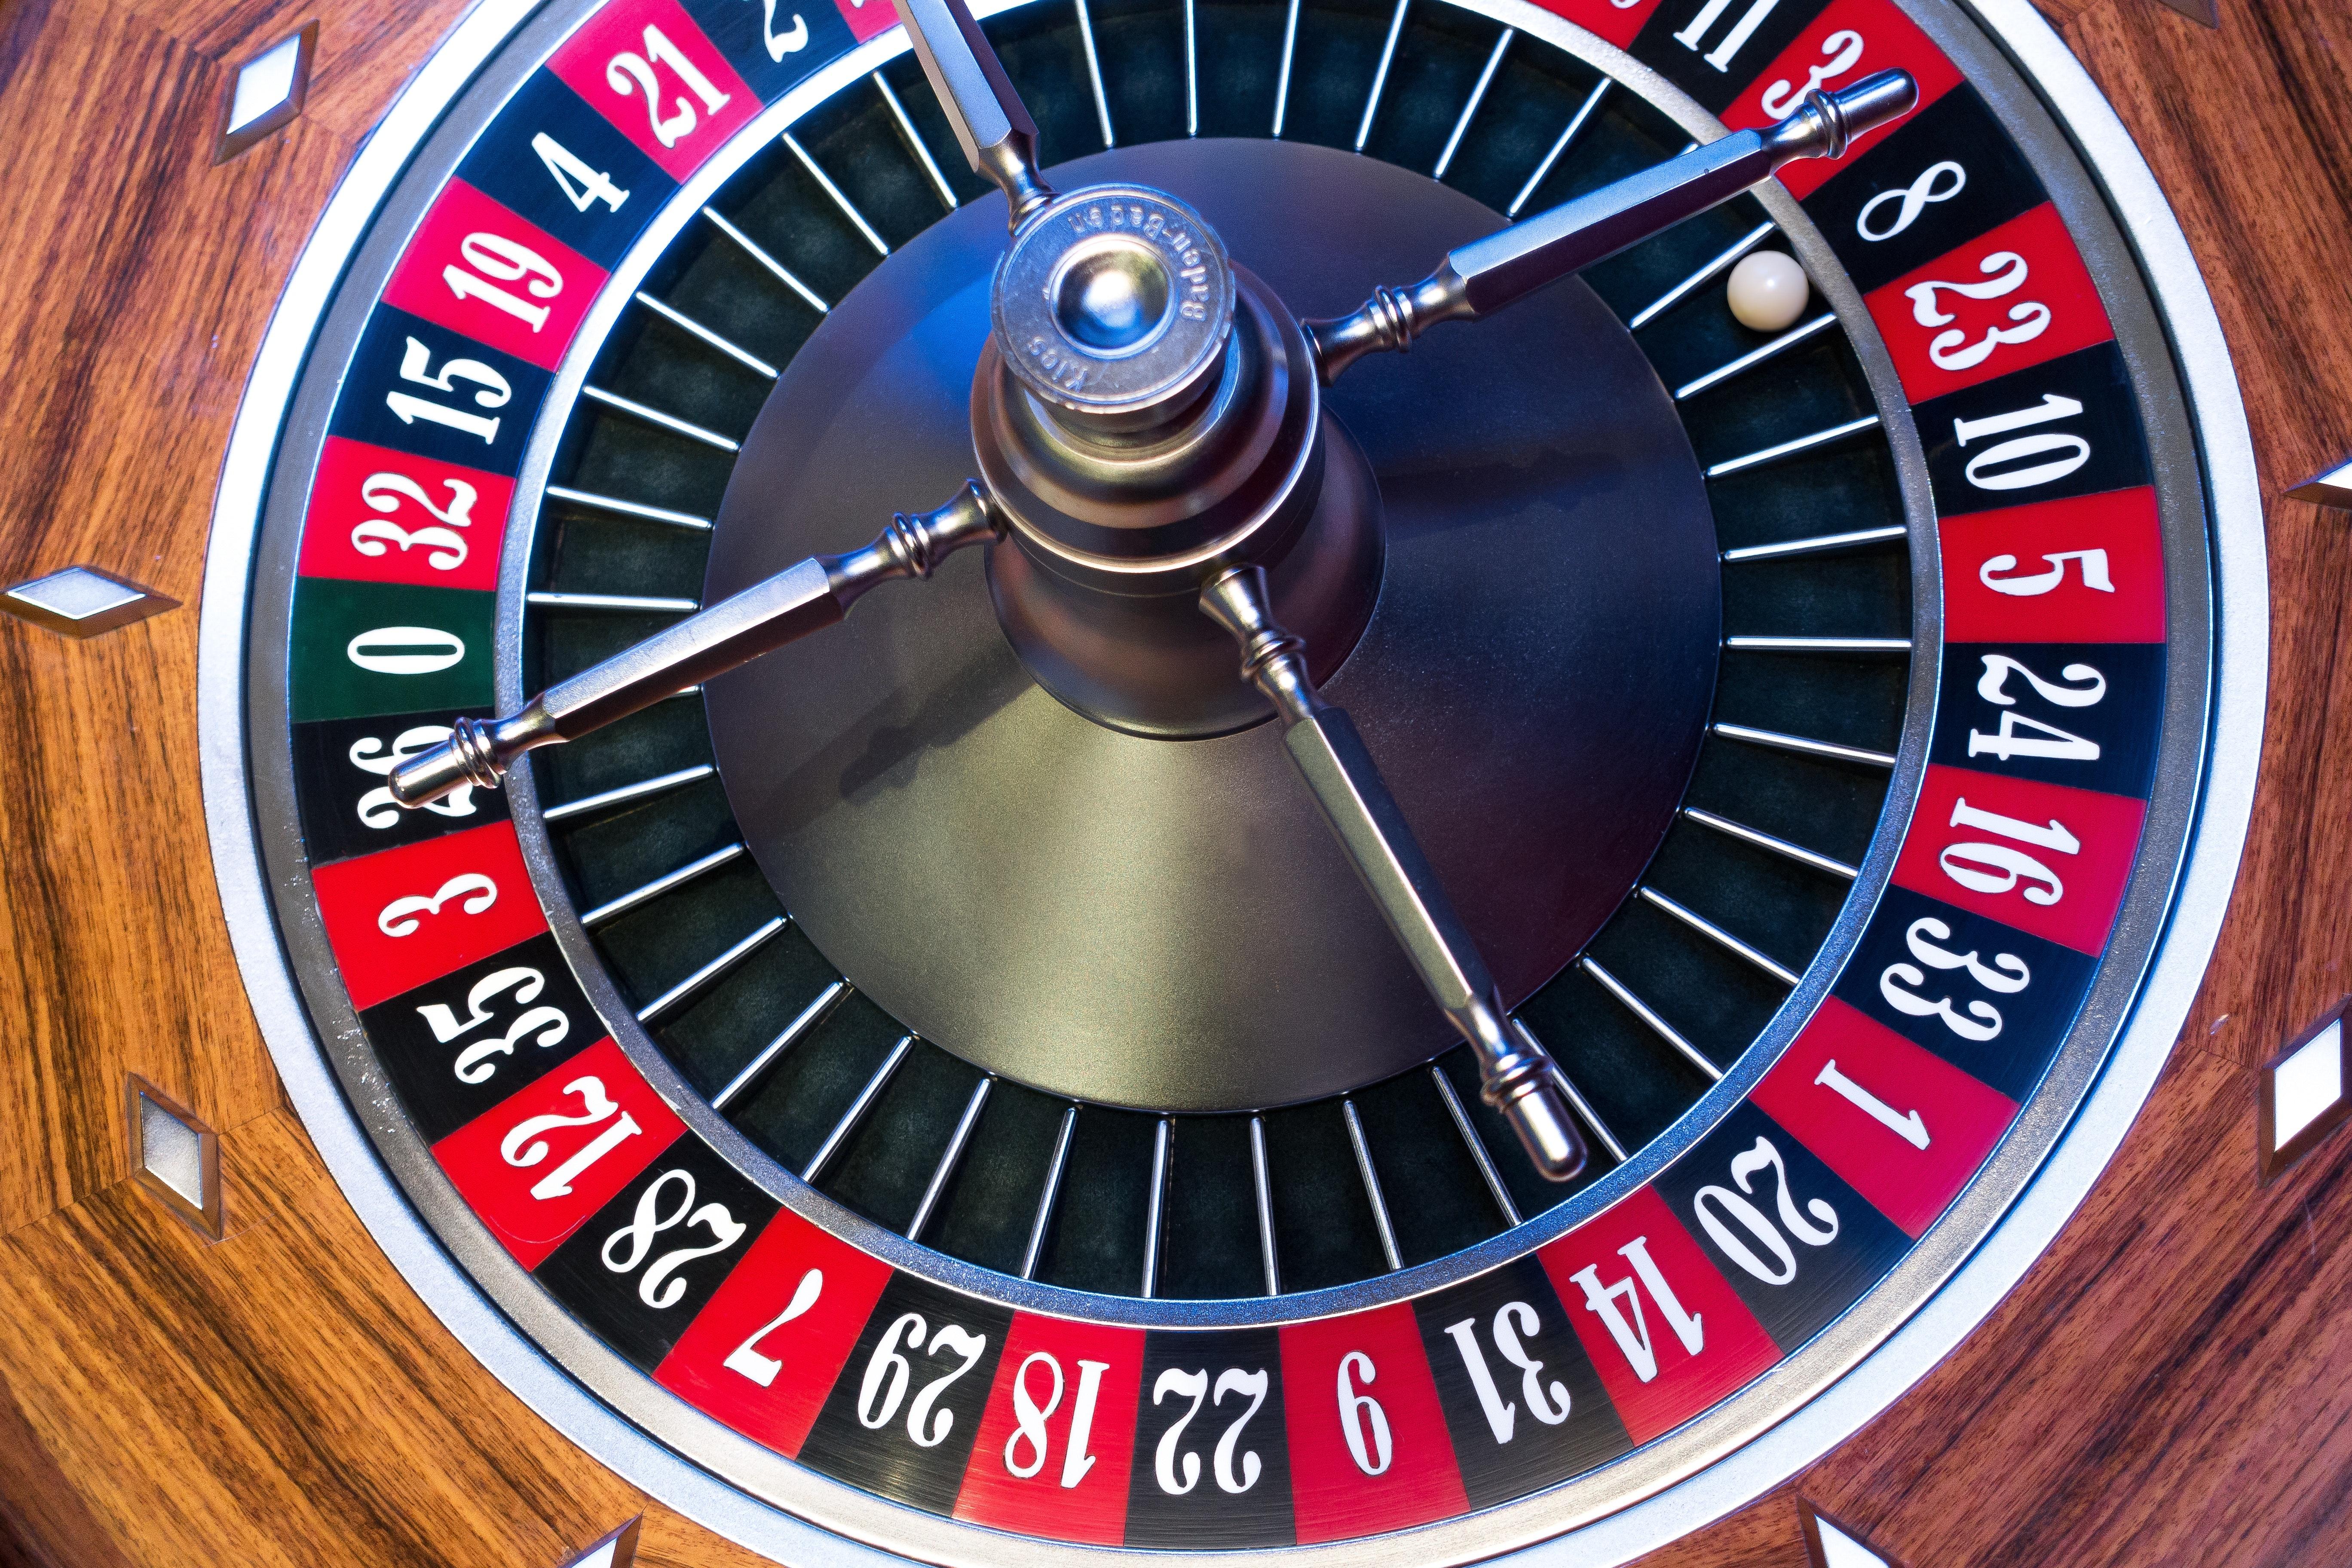 Black Jack Casino Toernooi (15,00 P.p)